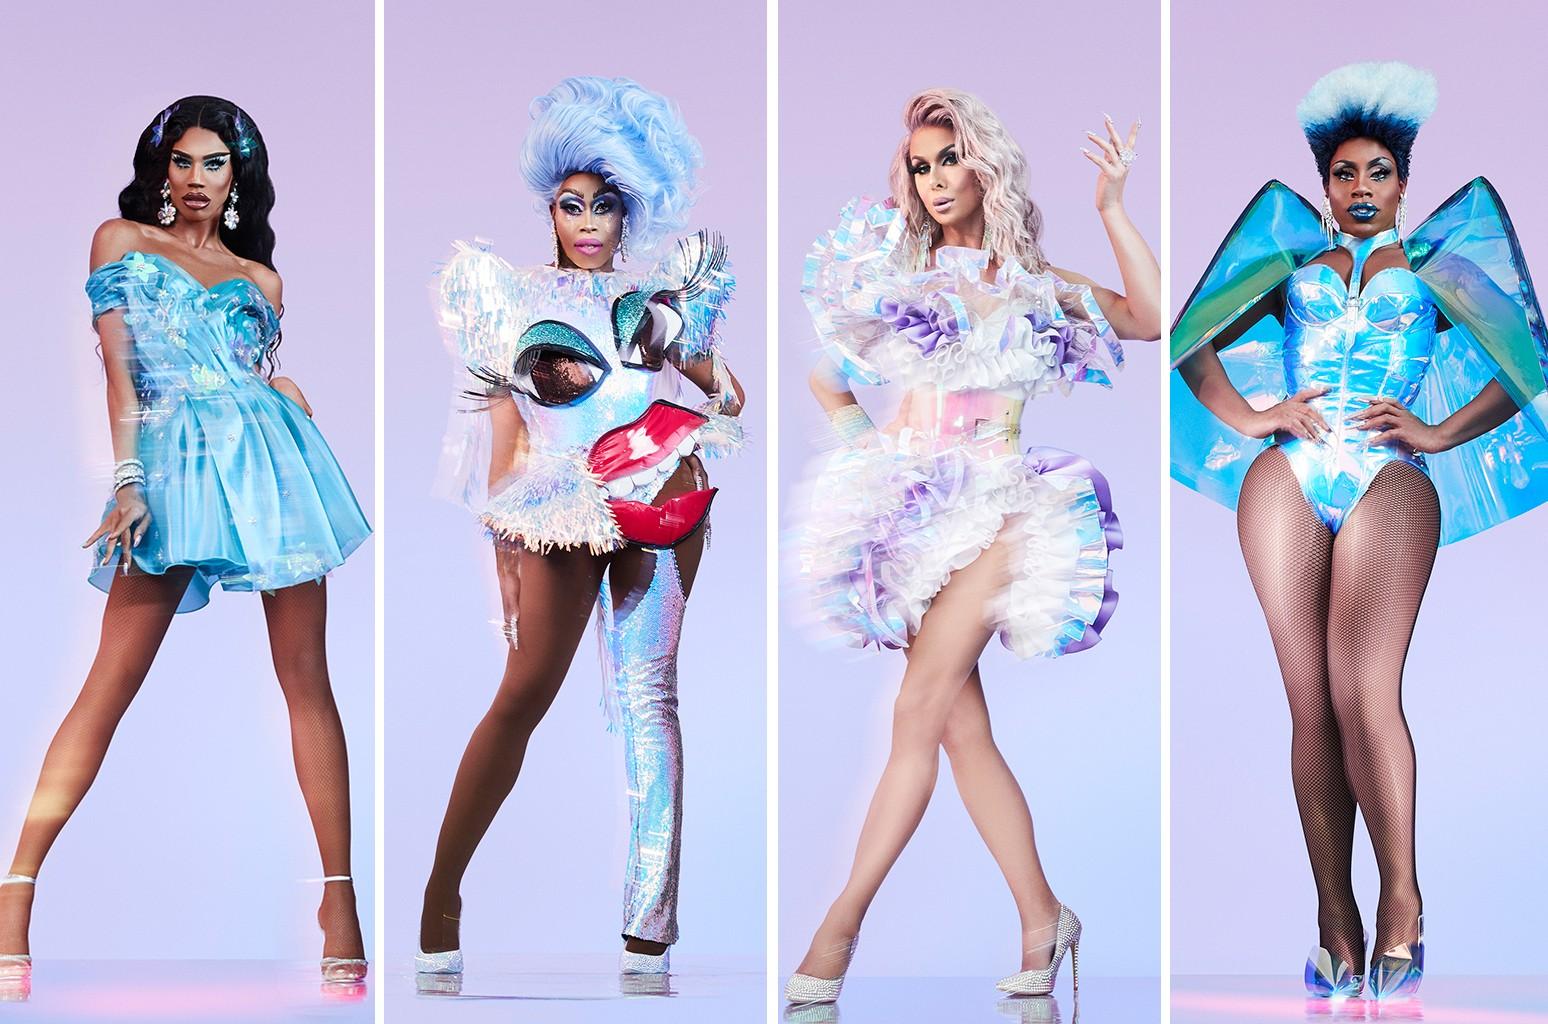 Naomi Smalls, Monique Heart, Trinity Taylor and Monet X Change